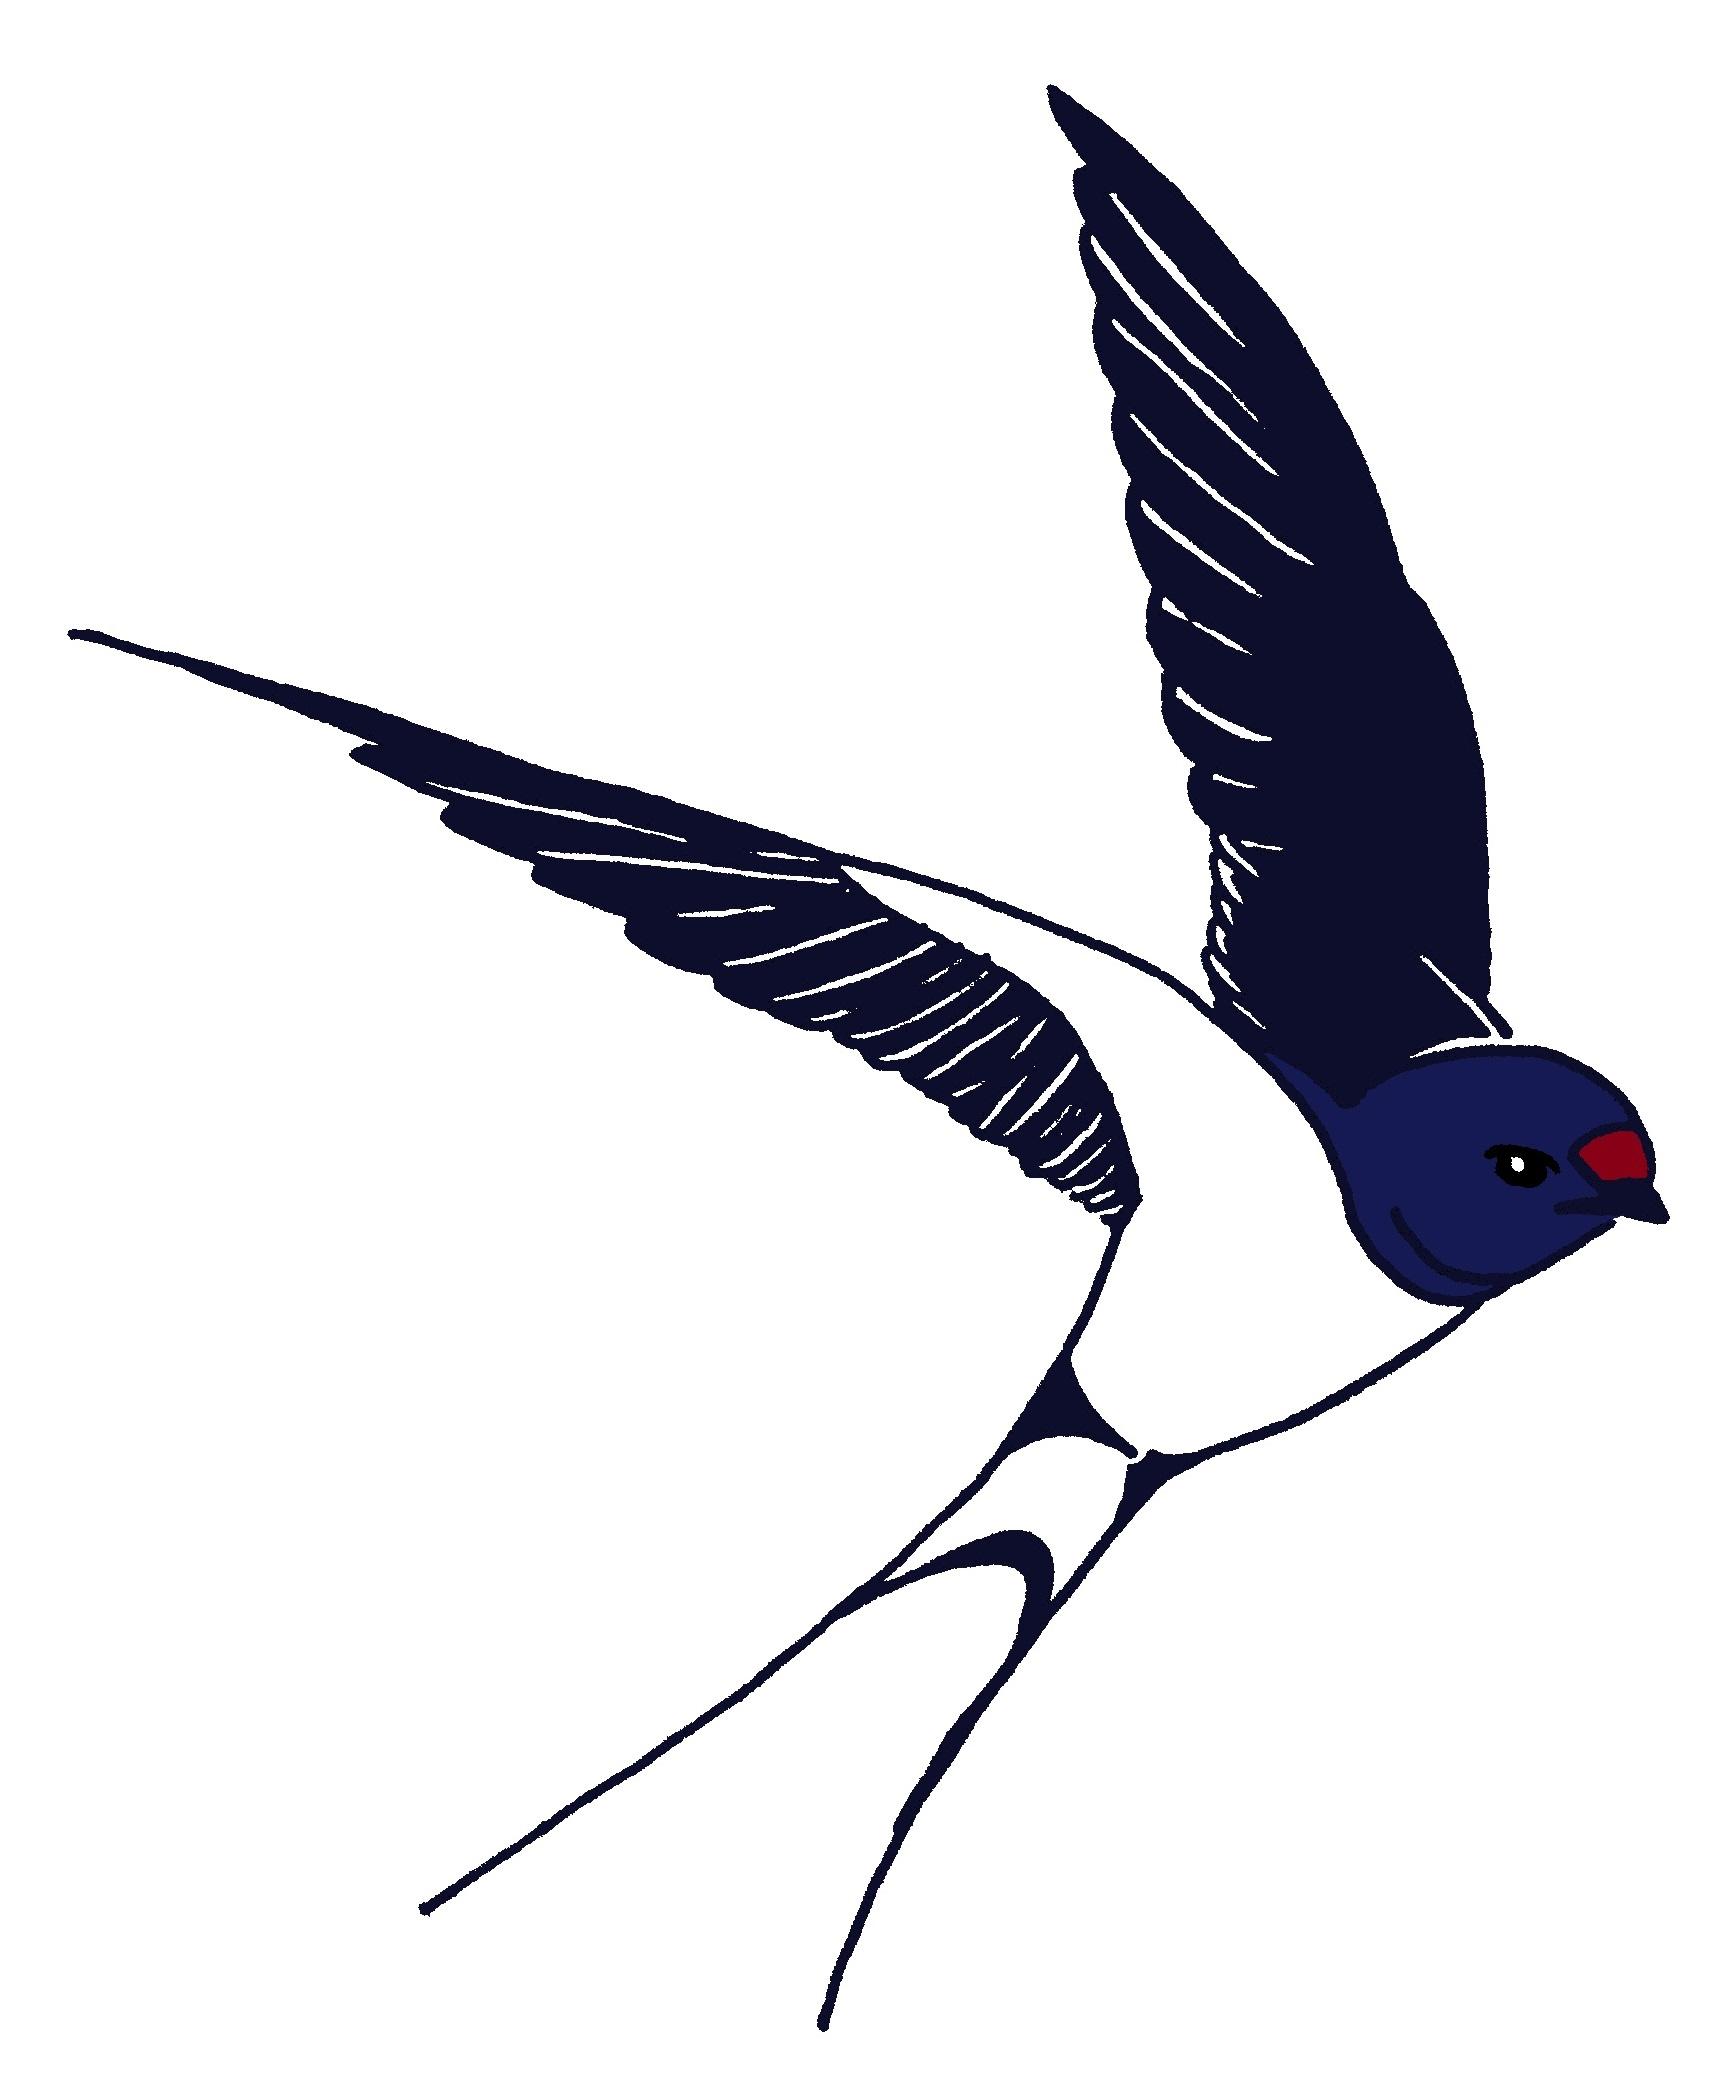 logo 5 flight of a barn swallow logo 5 flight of a barn swallow